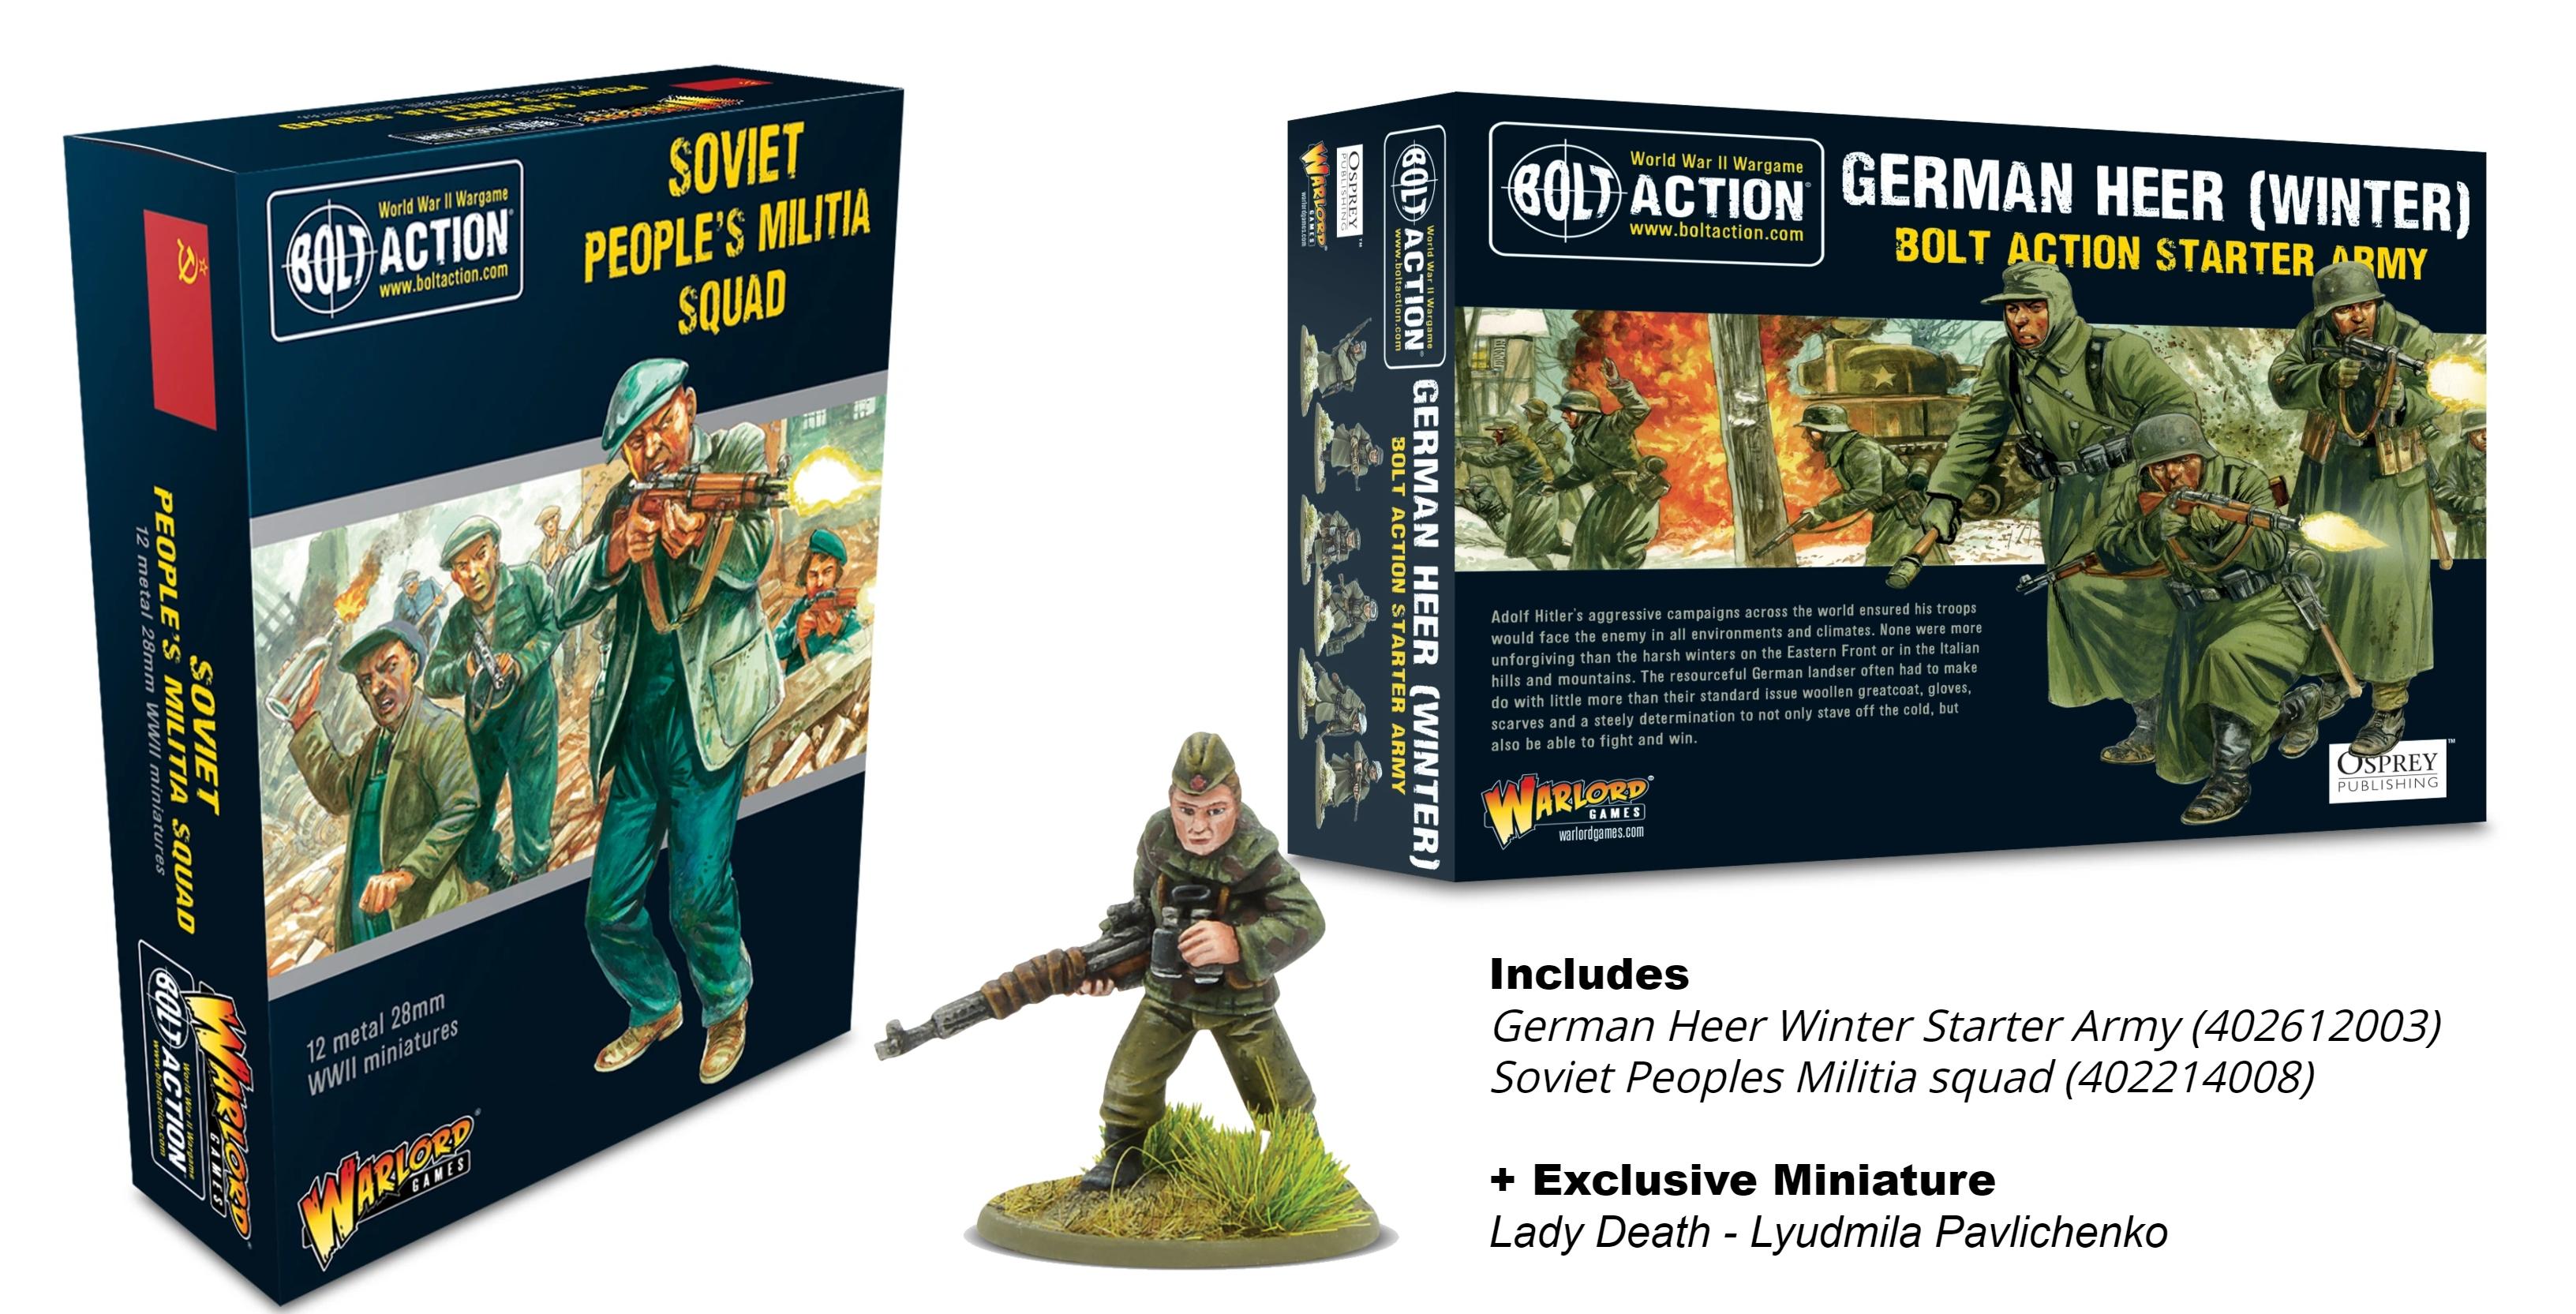 Bolt Action Winter Soviet Army Bundle w/ Lady Death Figure (Exclusive)